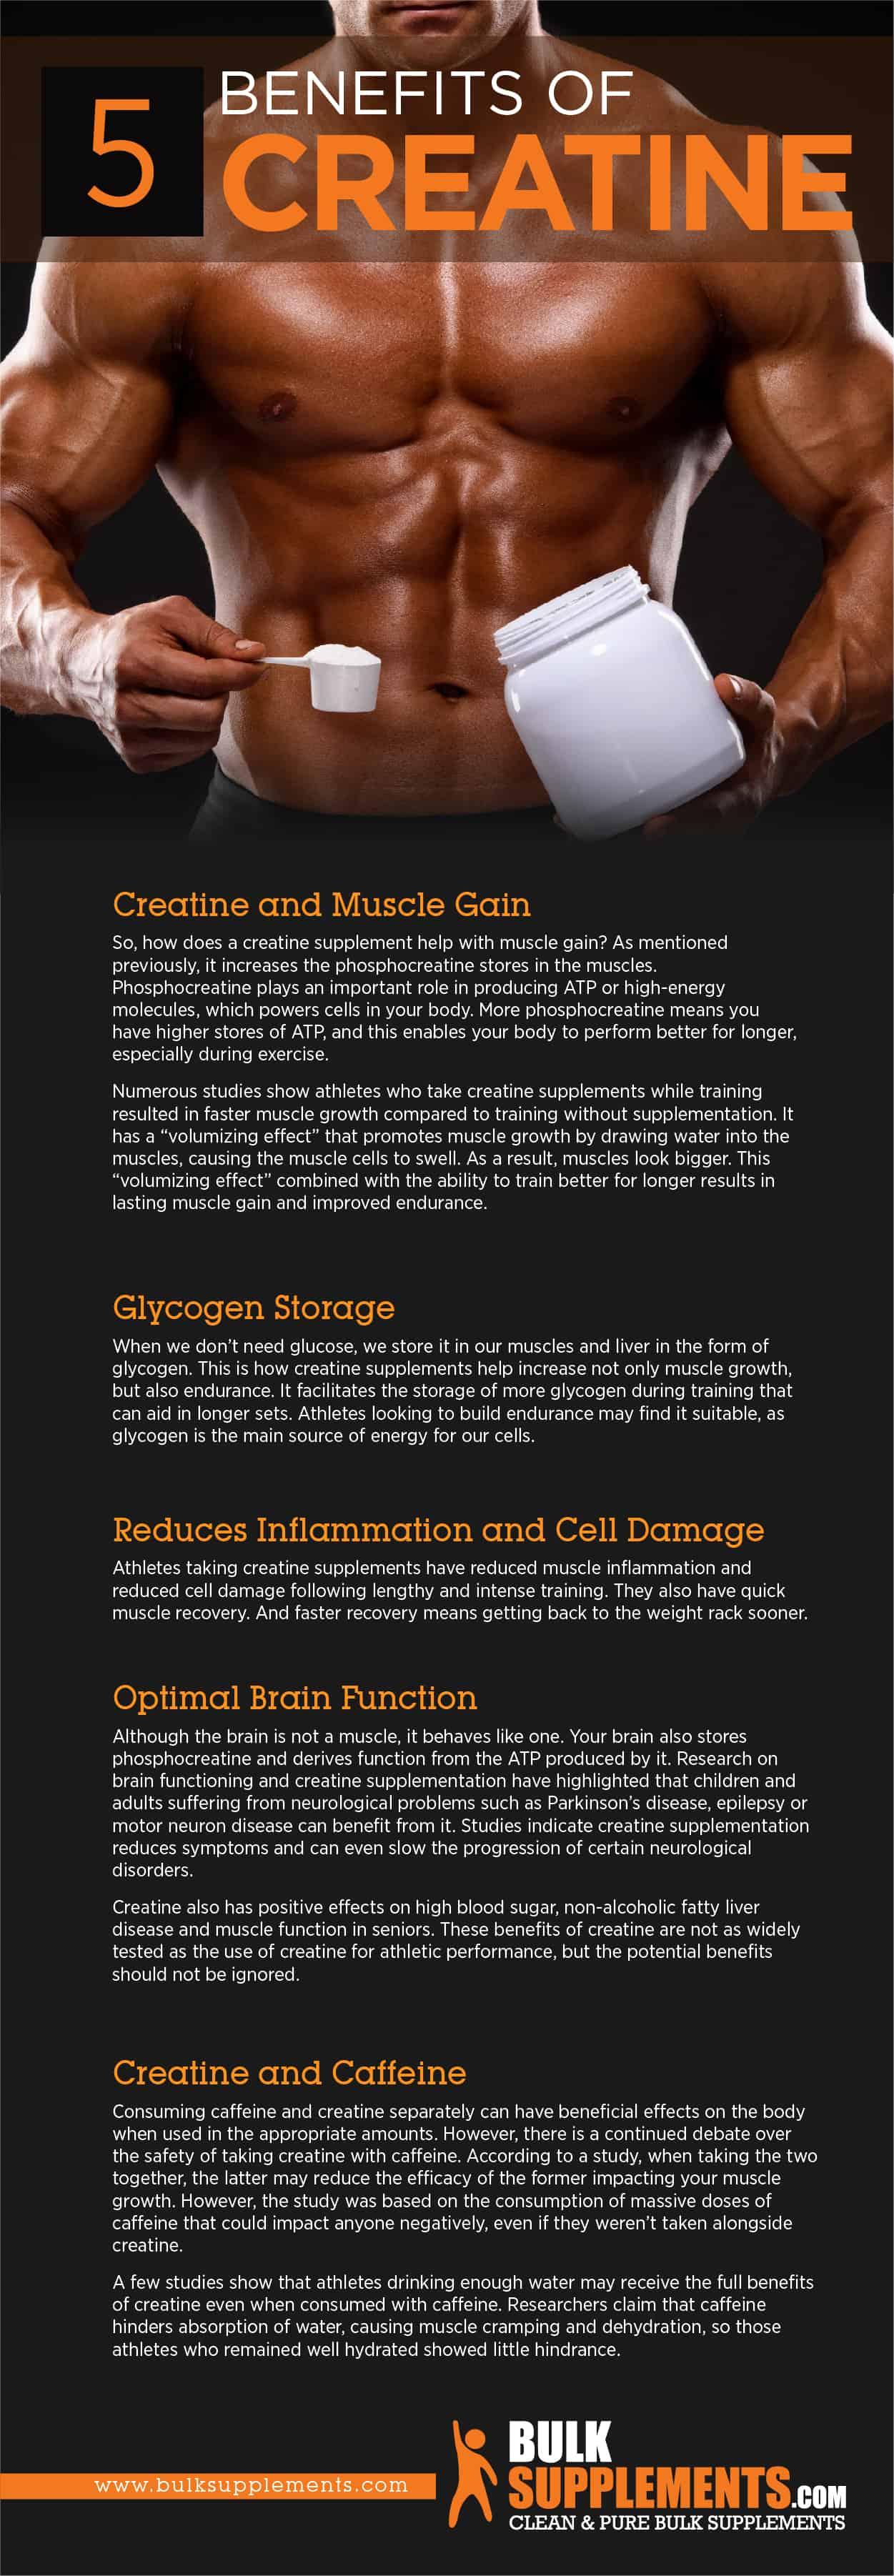 Benefits of creatine supplements